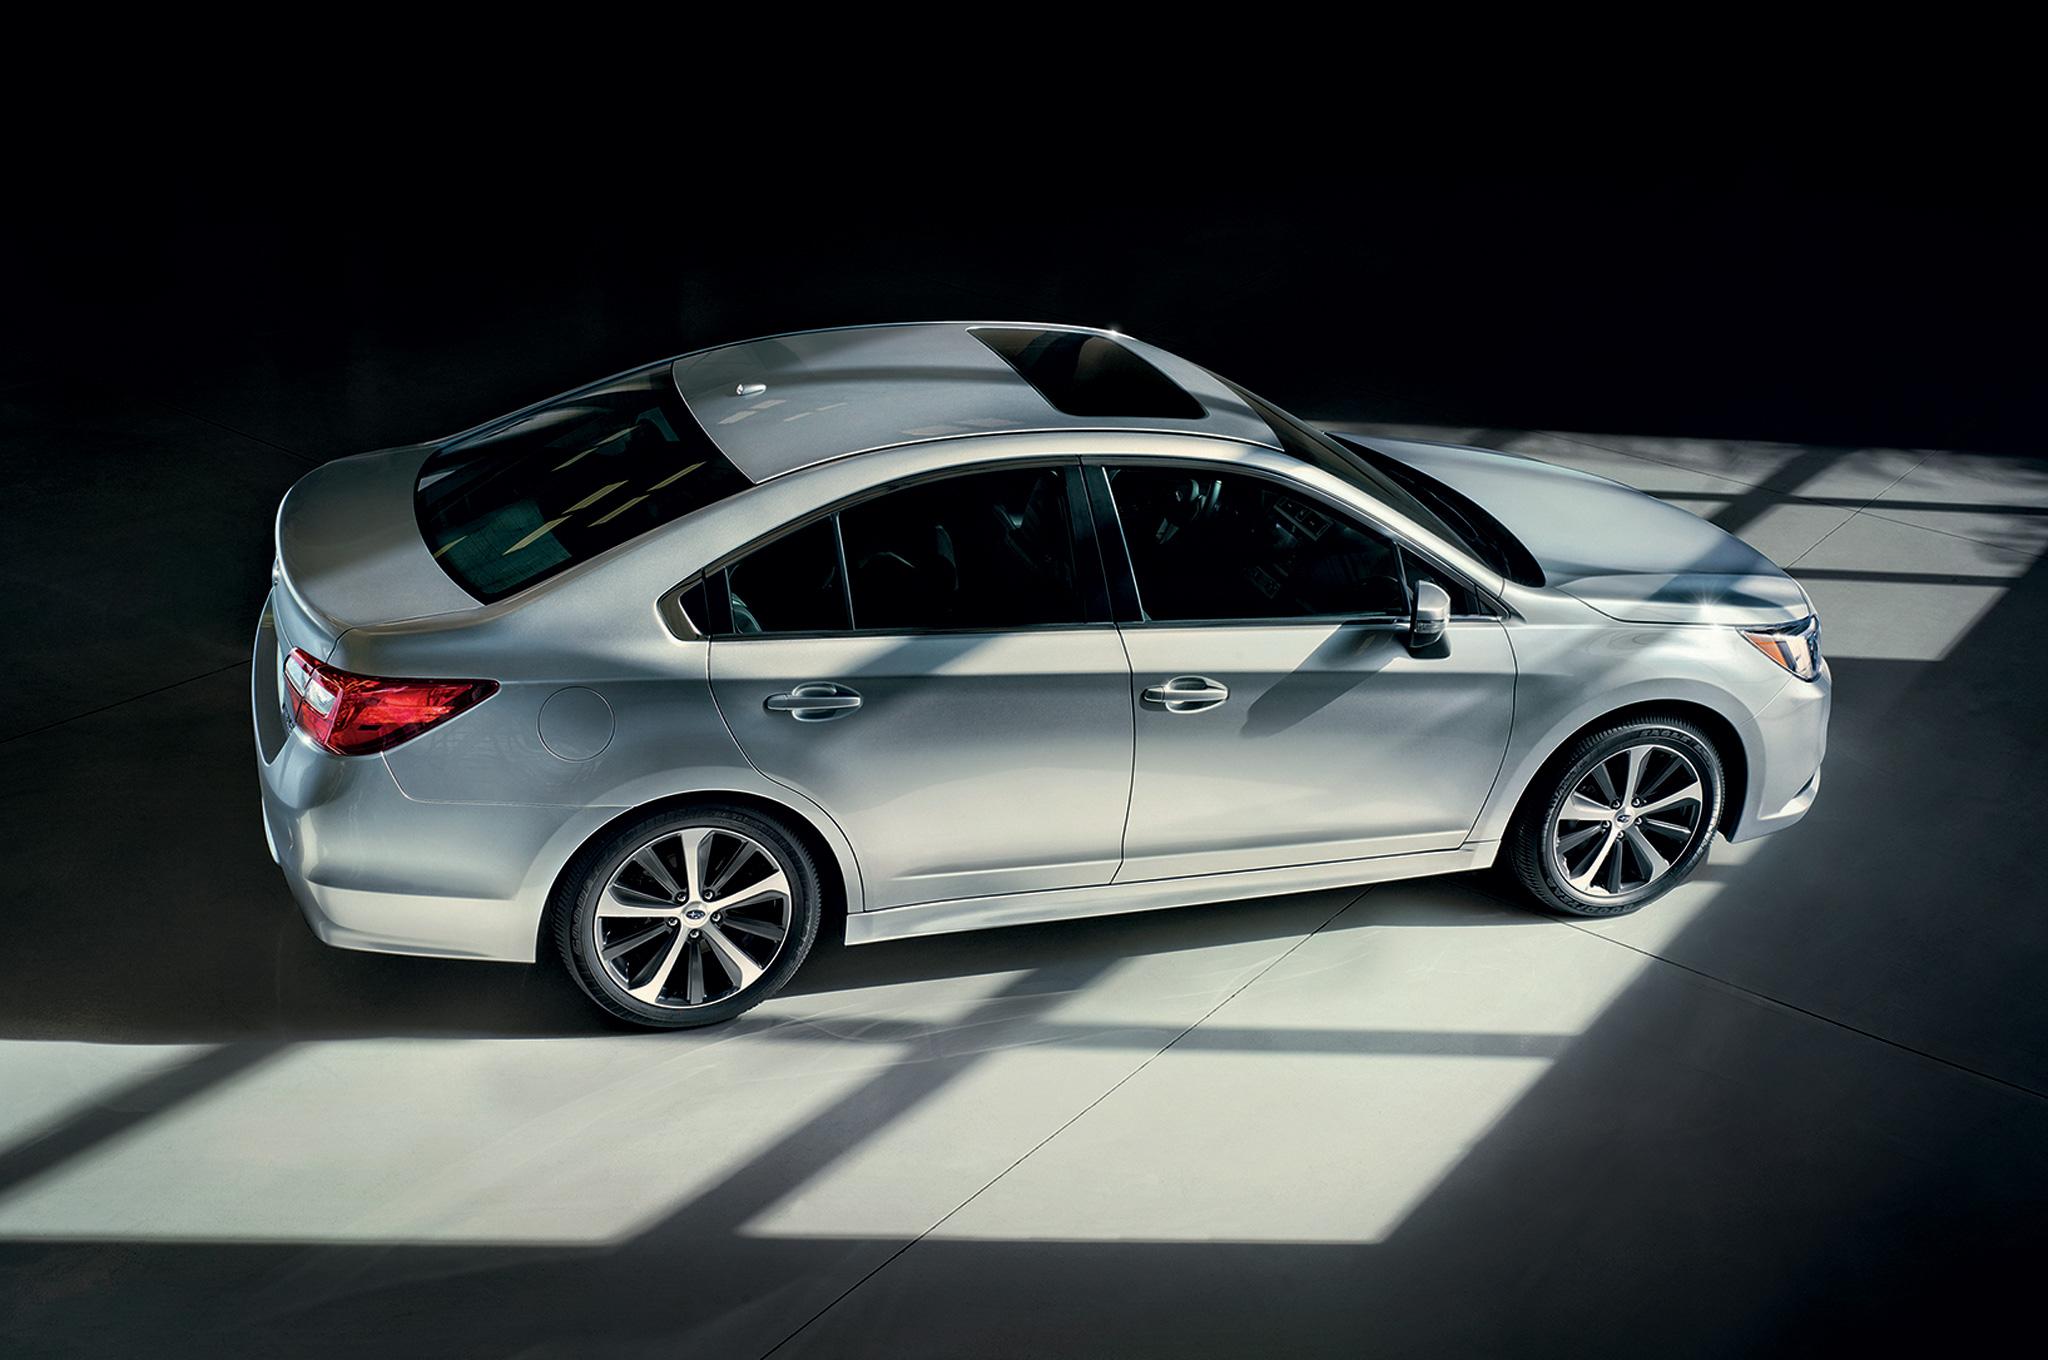 New: 2015 Subaru Legacy